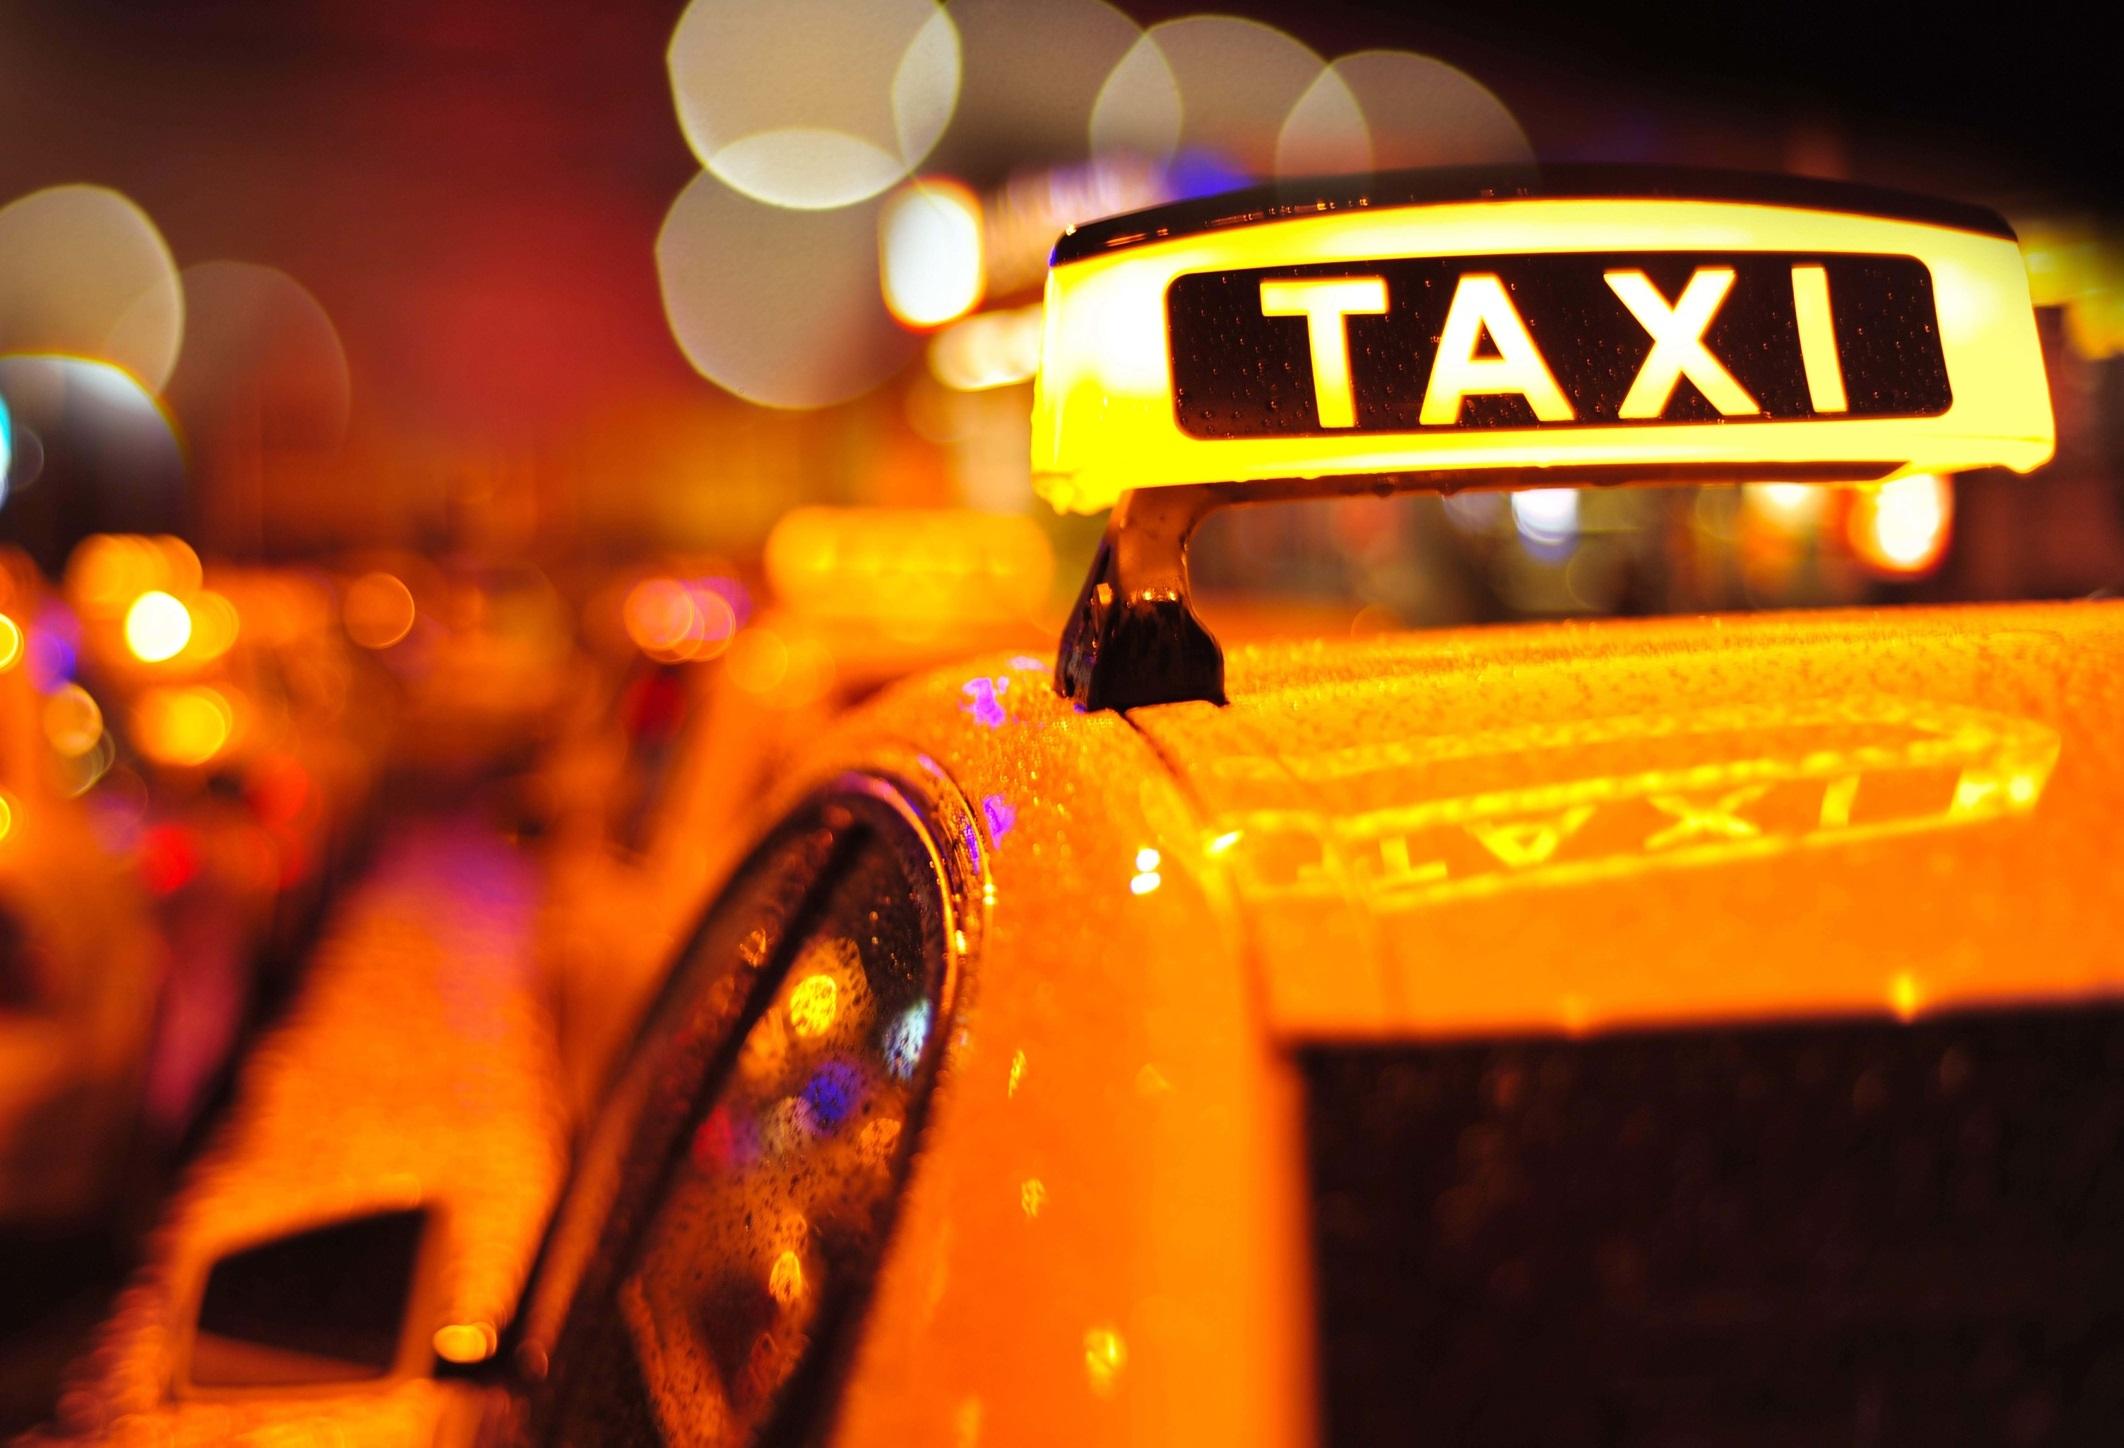 taxi, uber, lyft, ridesharing